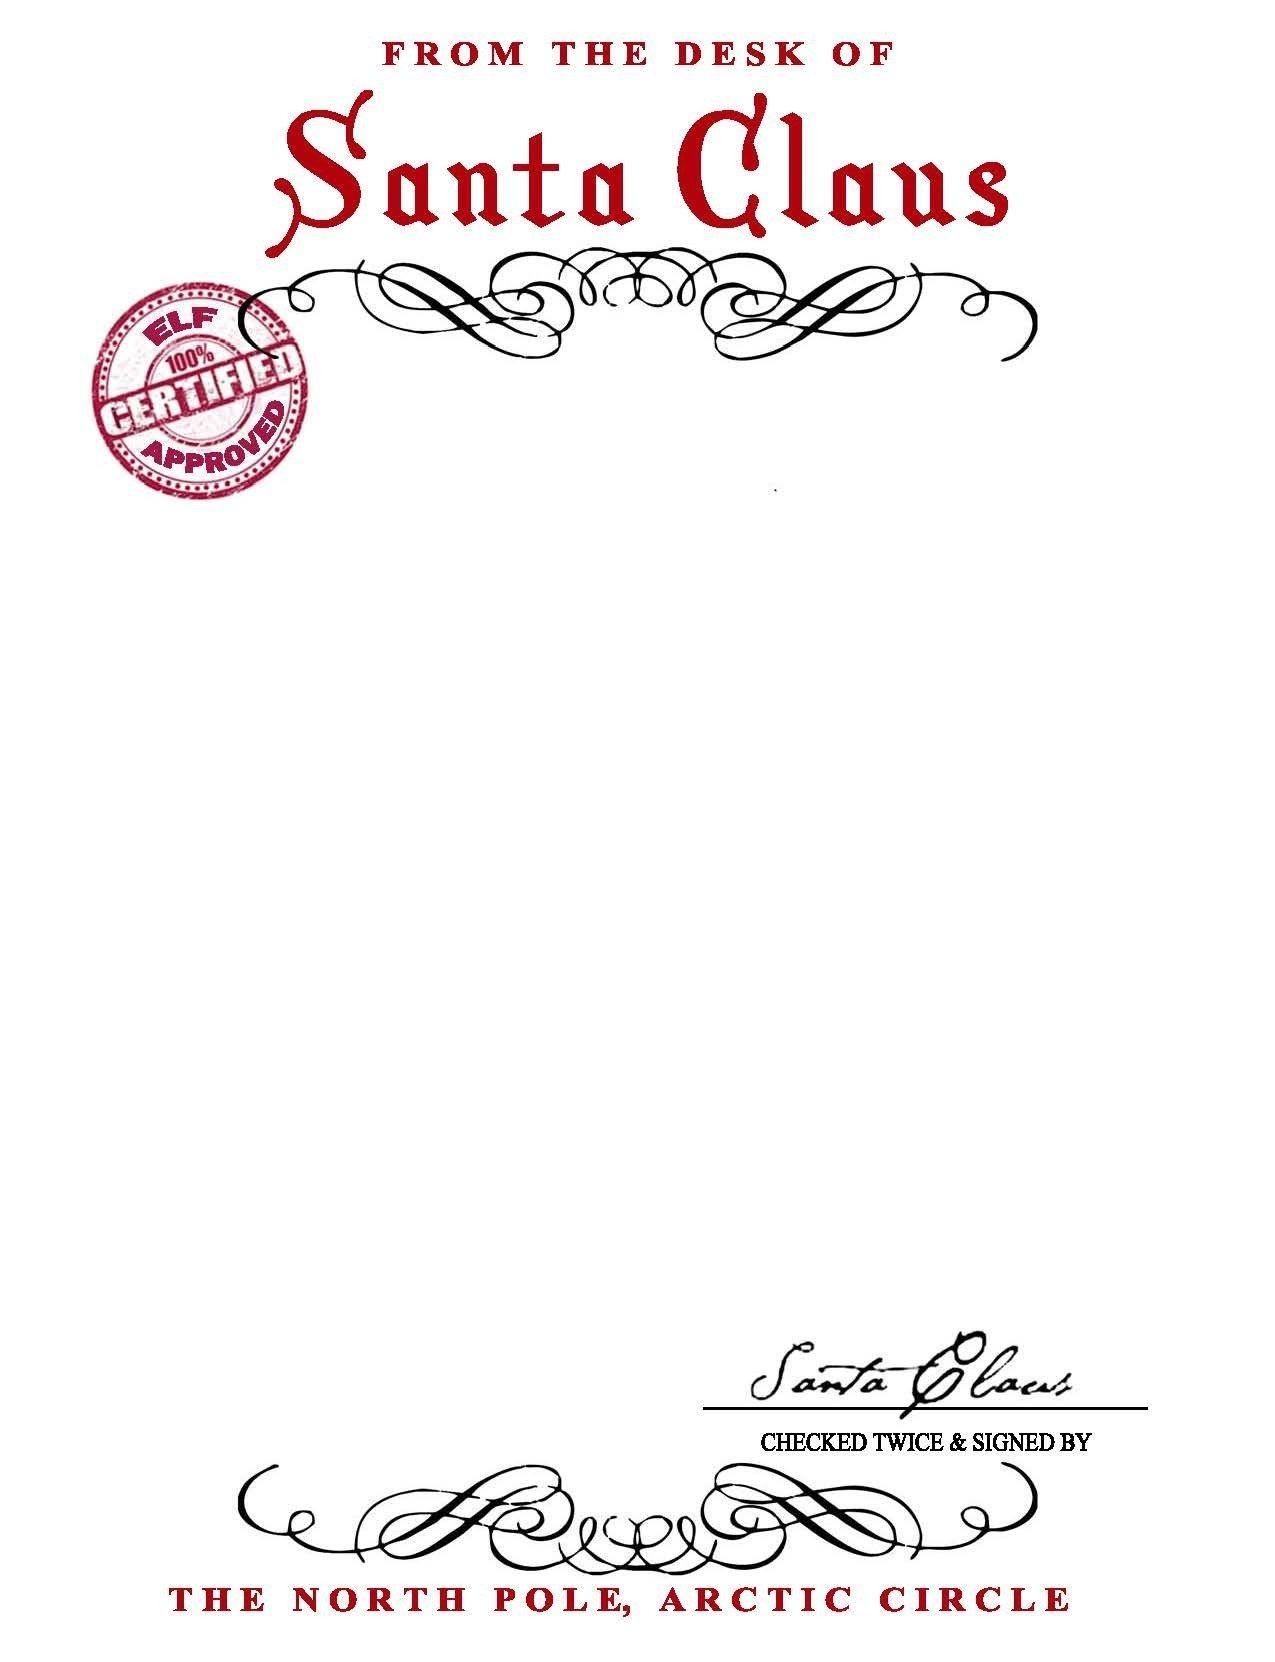 13 Best Images Of Free Printable Santa Letter Stationary - Santa - Free Printable Santa Letter Paper